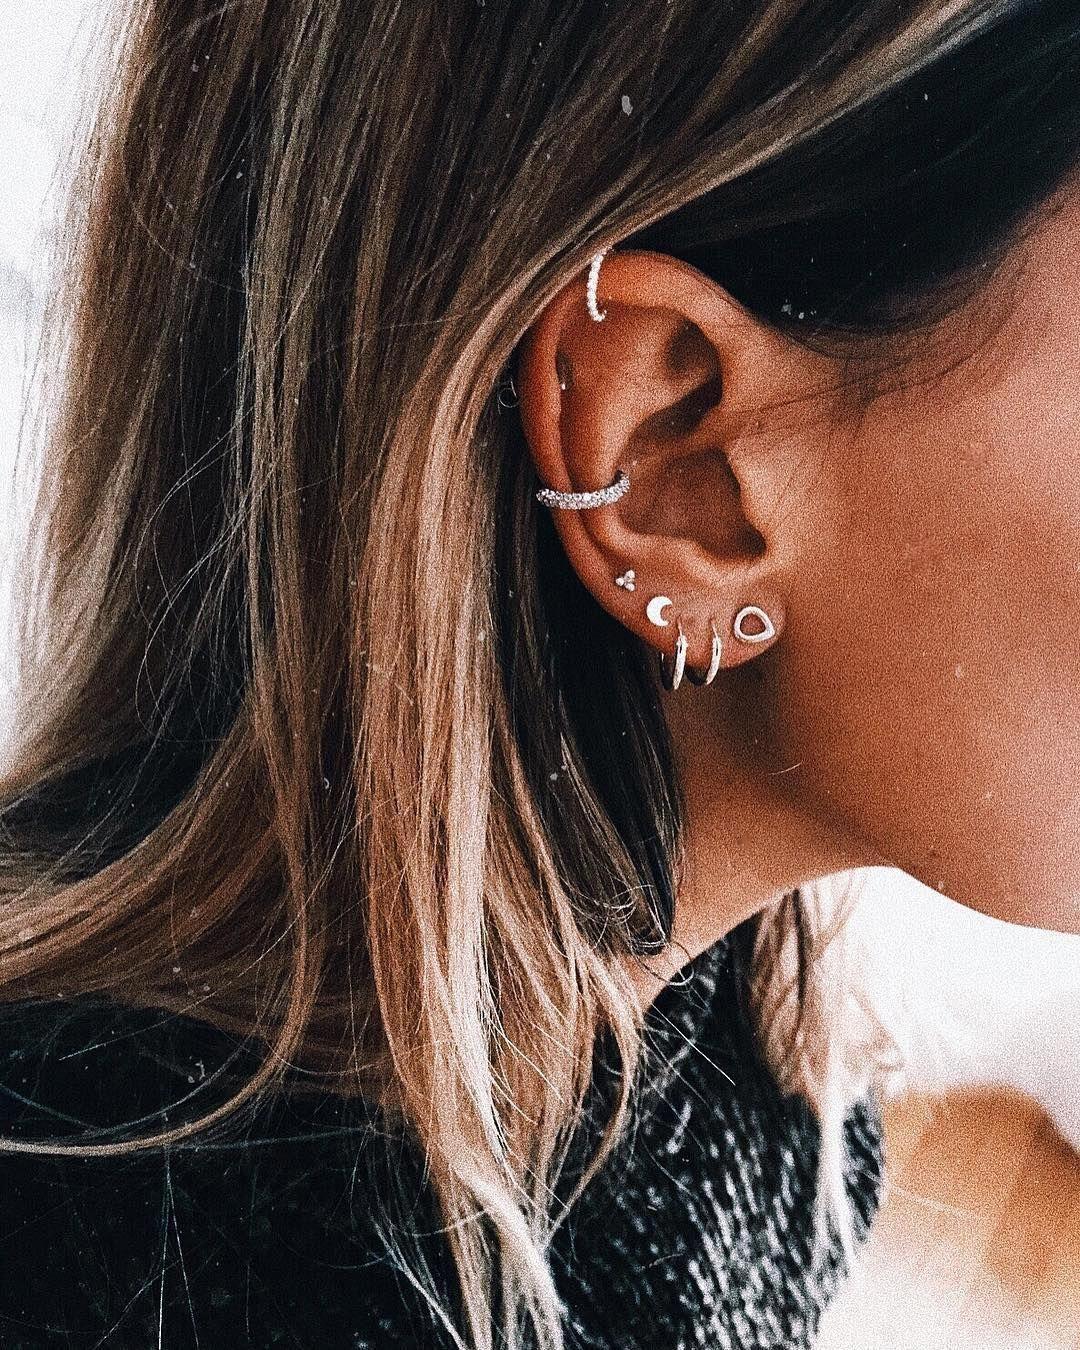 14k Yellow Gold Disk Design Heart Diamond Earrings Stud Post Studs Round Micro Pave Flat - Fine Jewelry Ideas